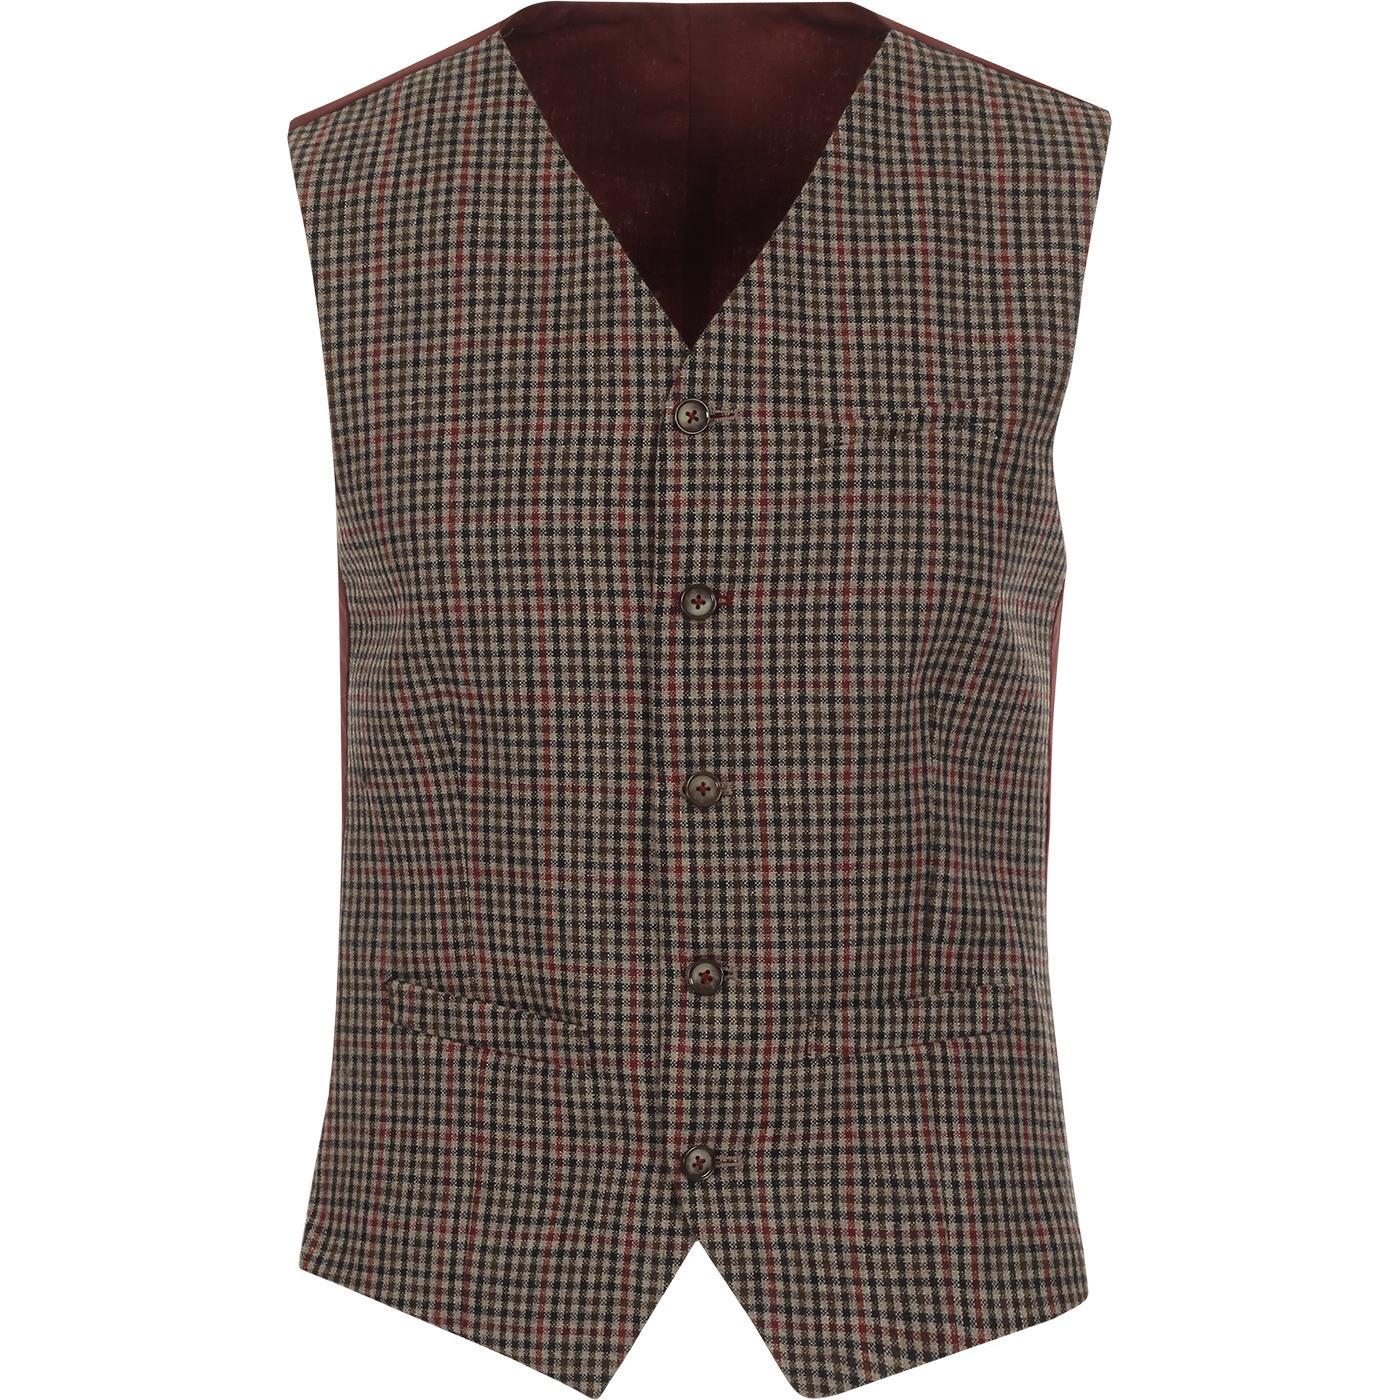 GIBSON LONDON Mod Tri-Colour Gingham Waistcoat